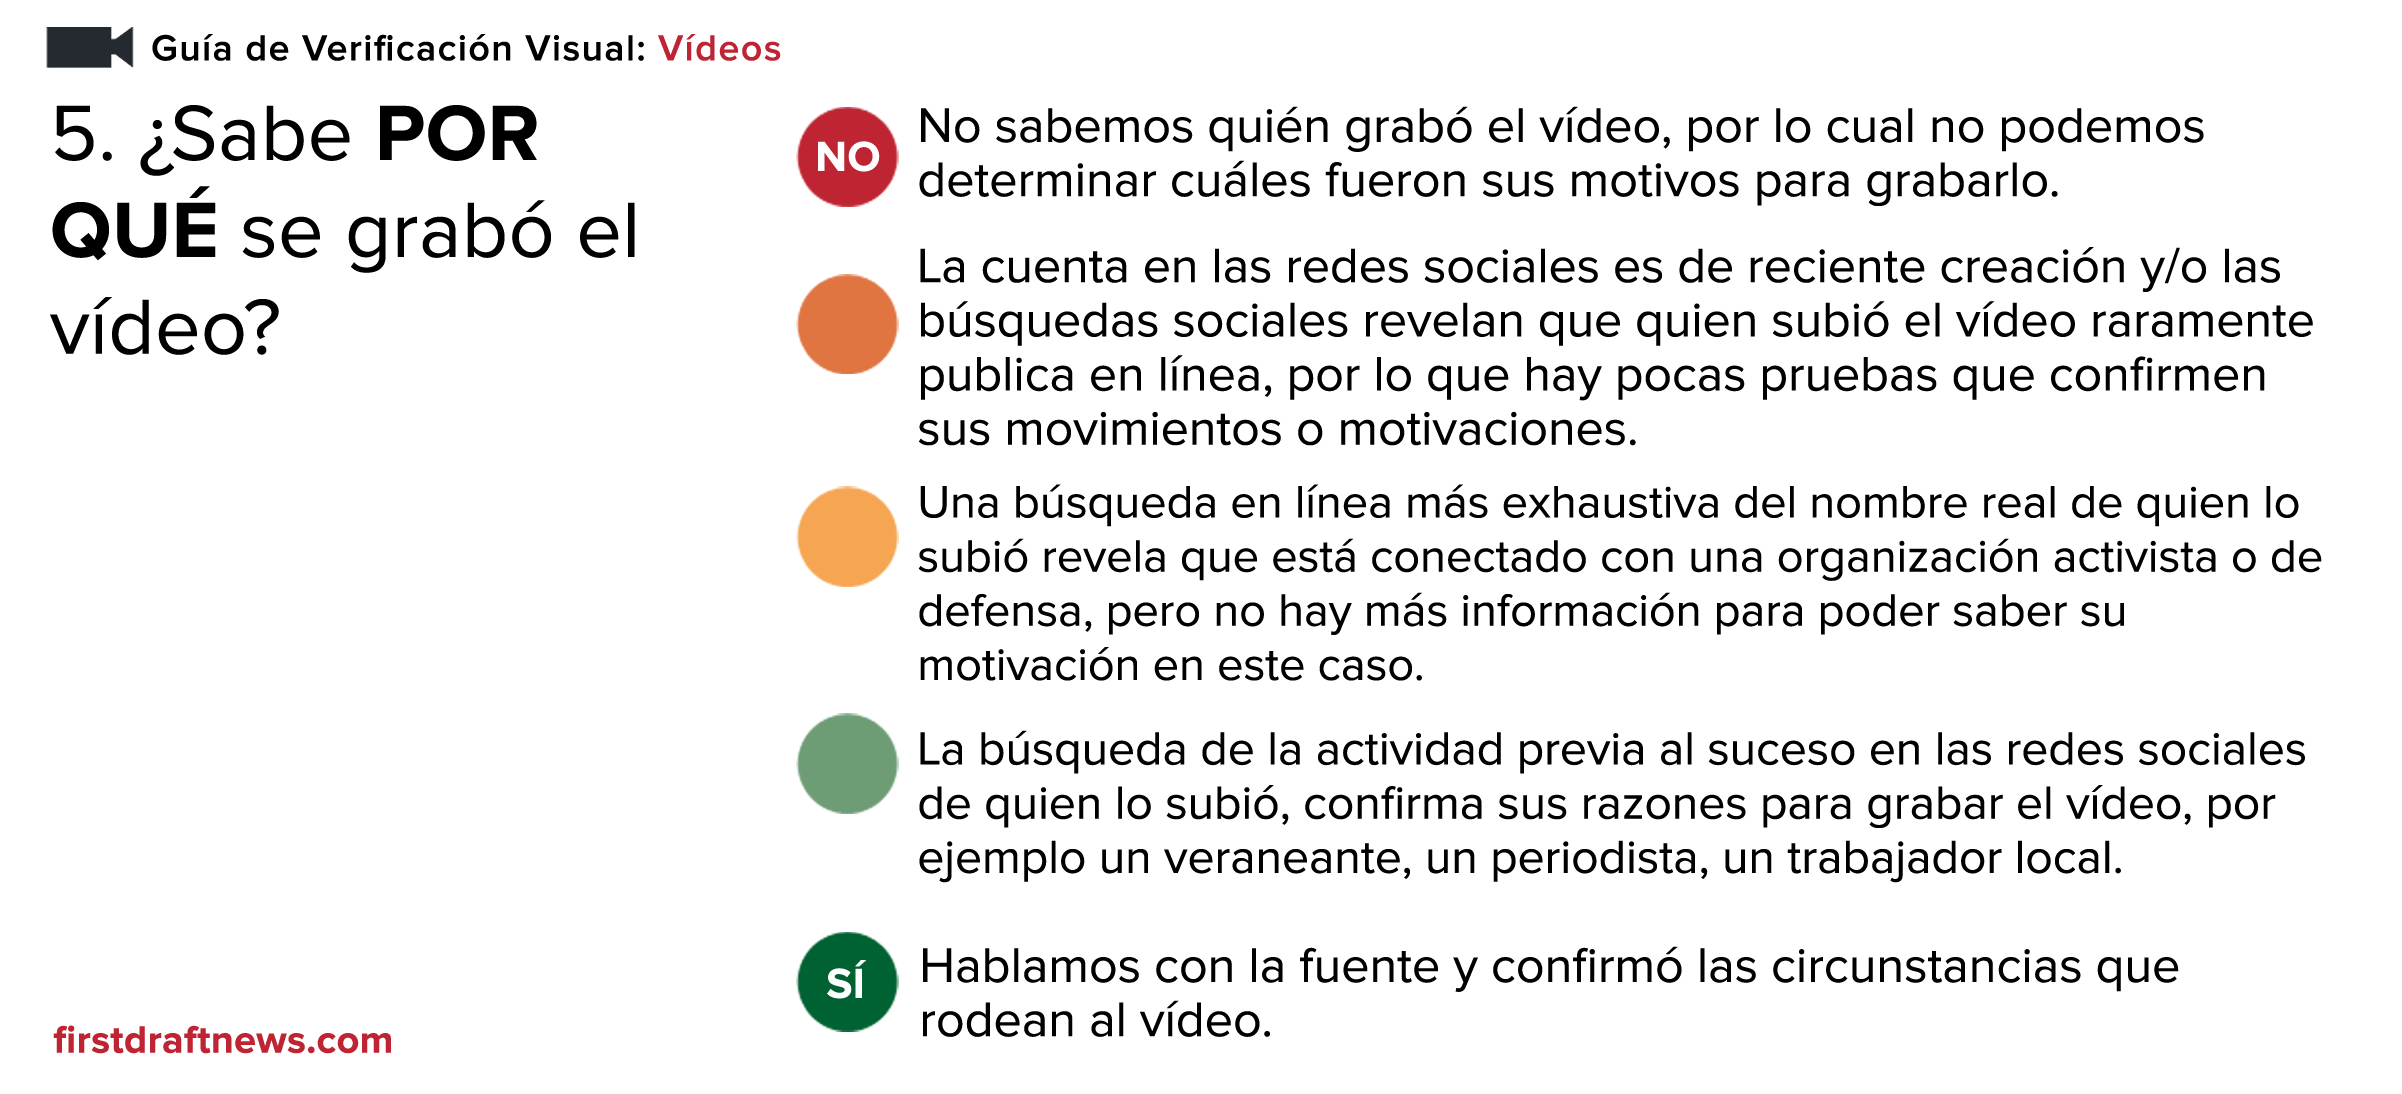 VVG - Video Spanish 5